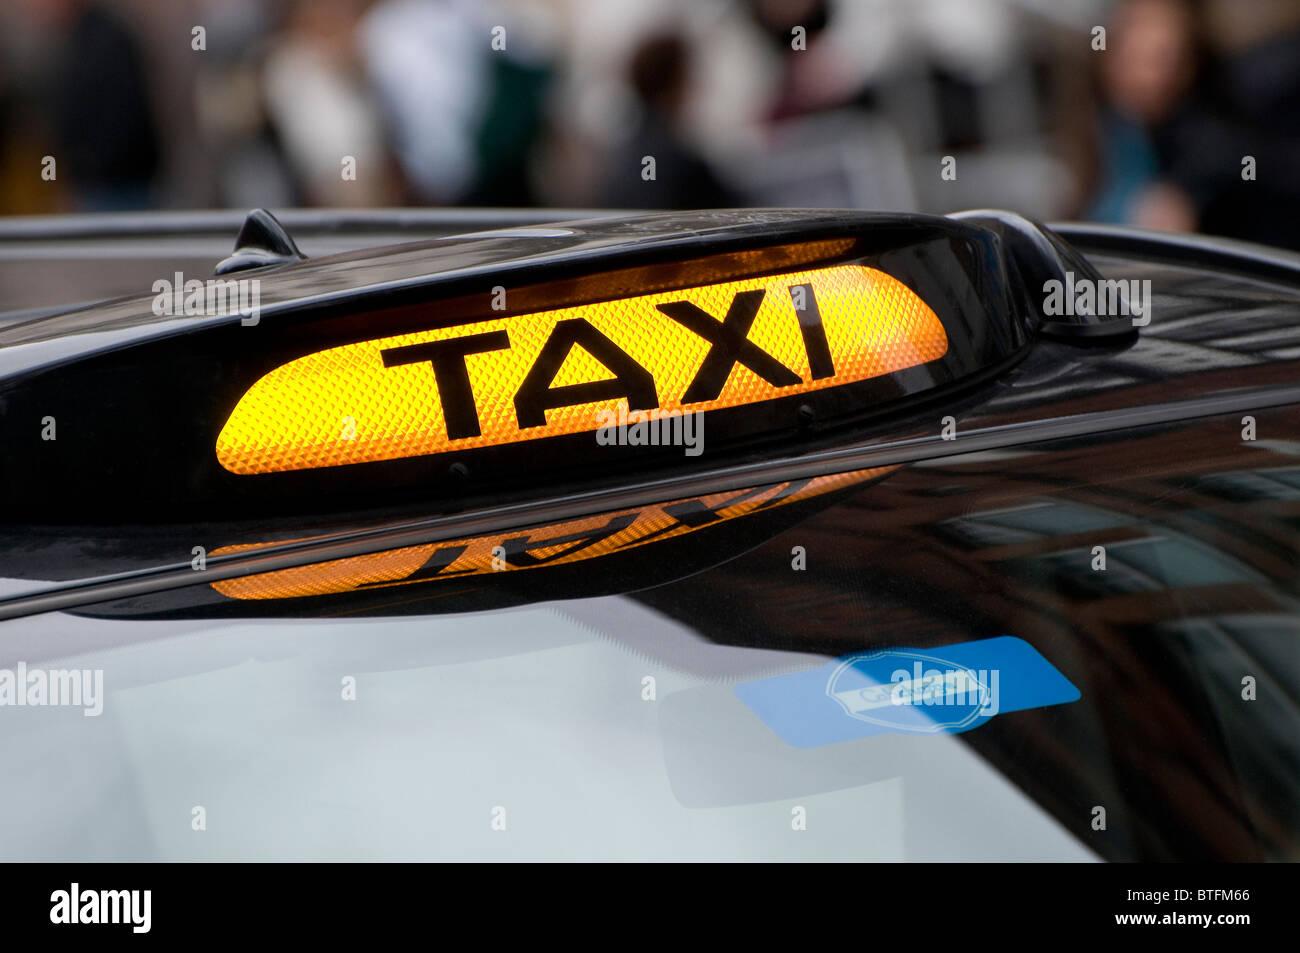 taxi cab sign, london, england Stock Photo